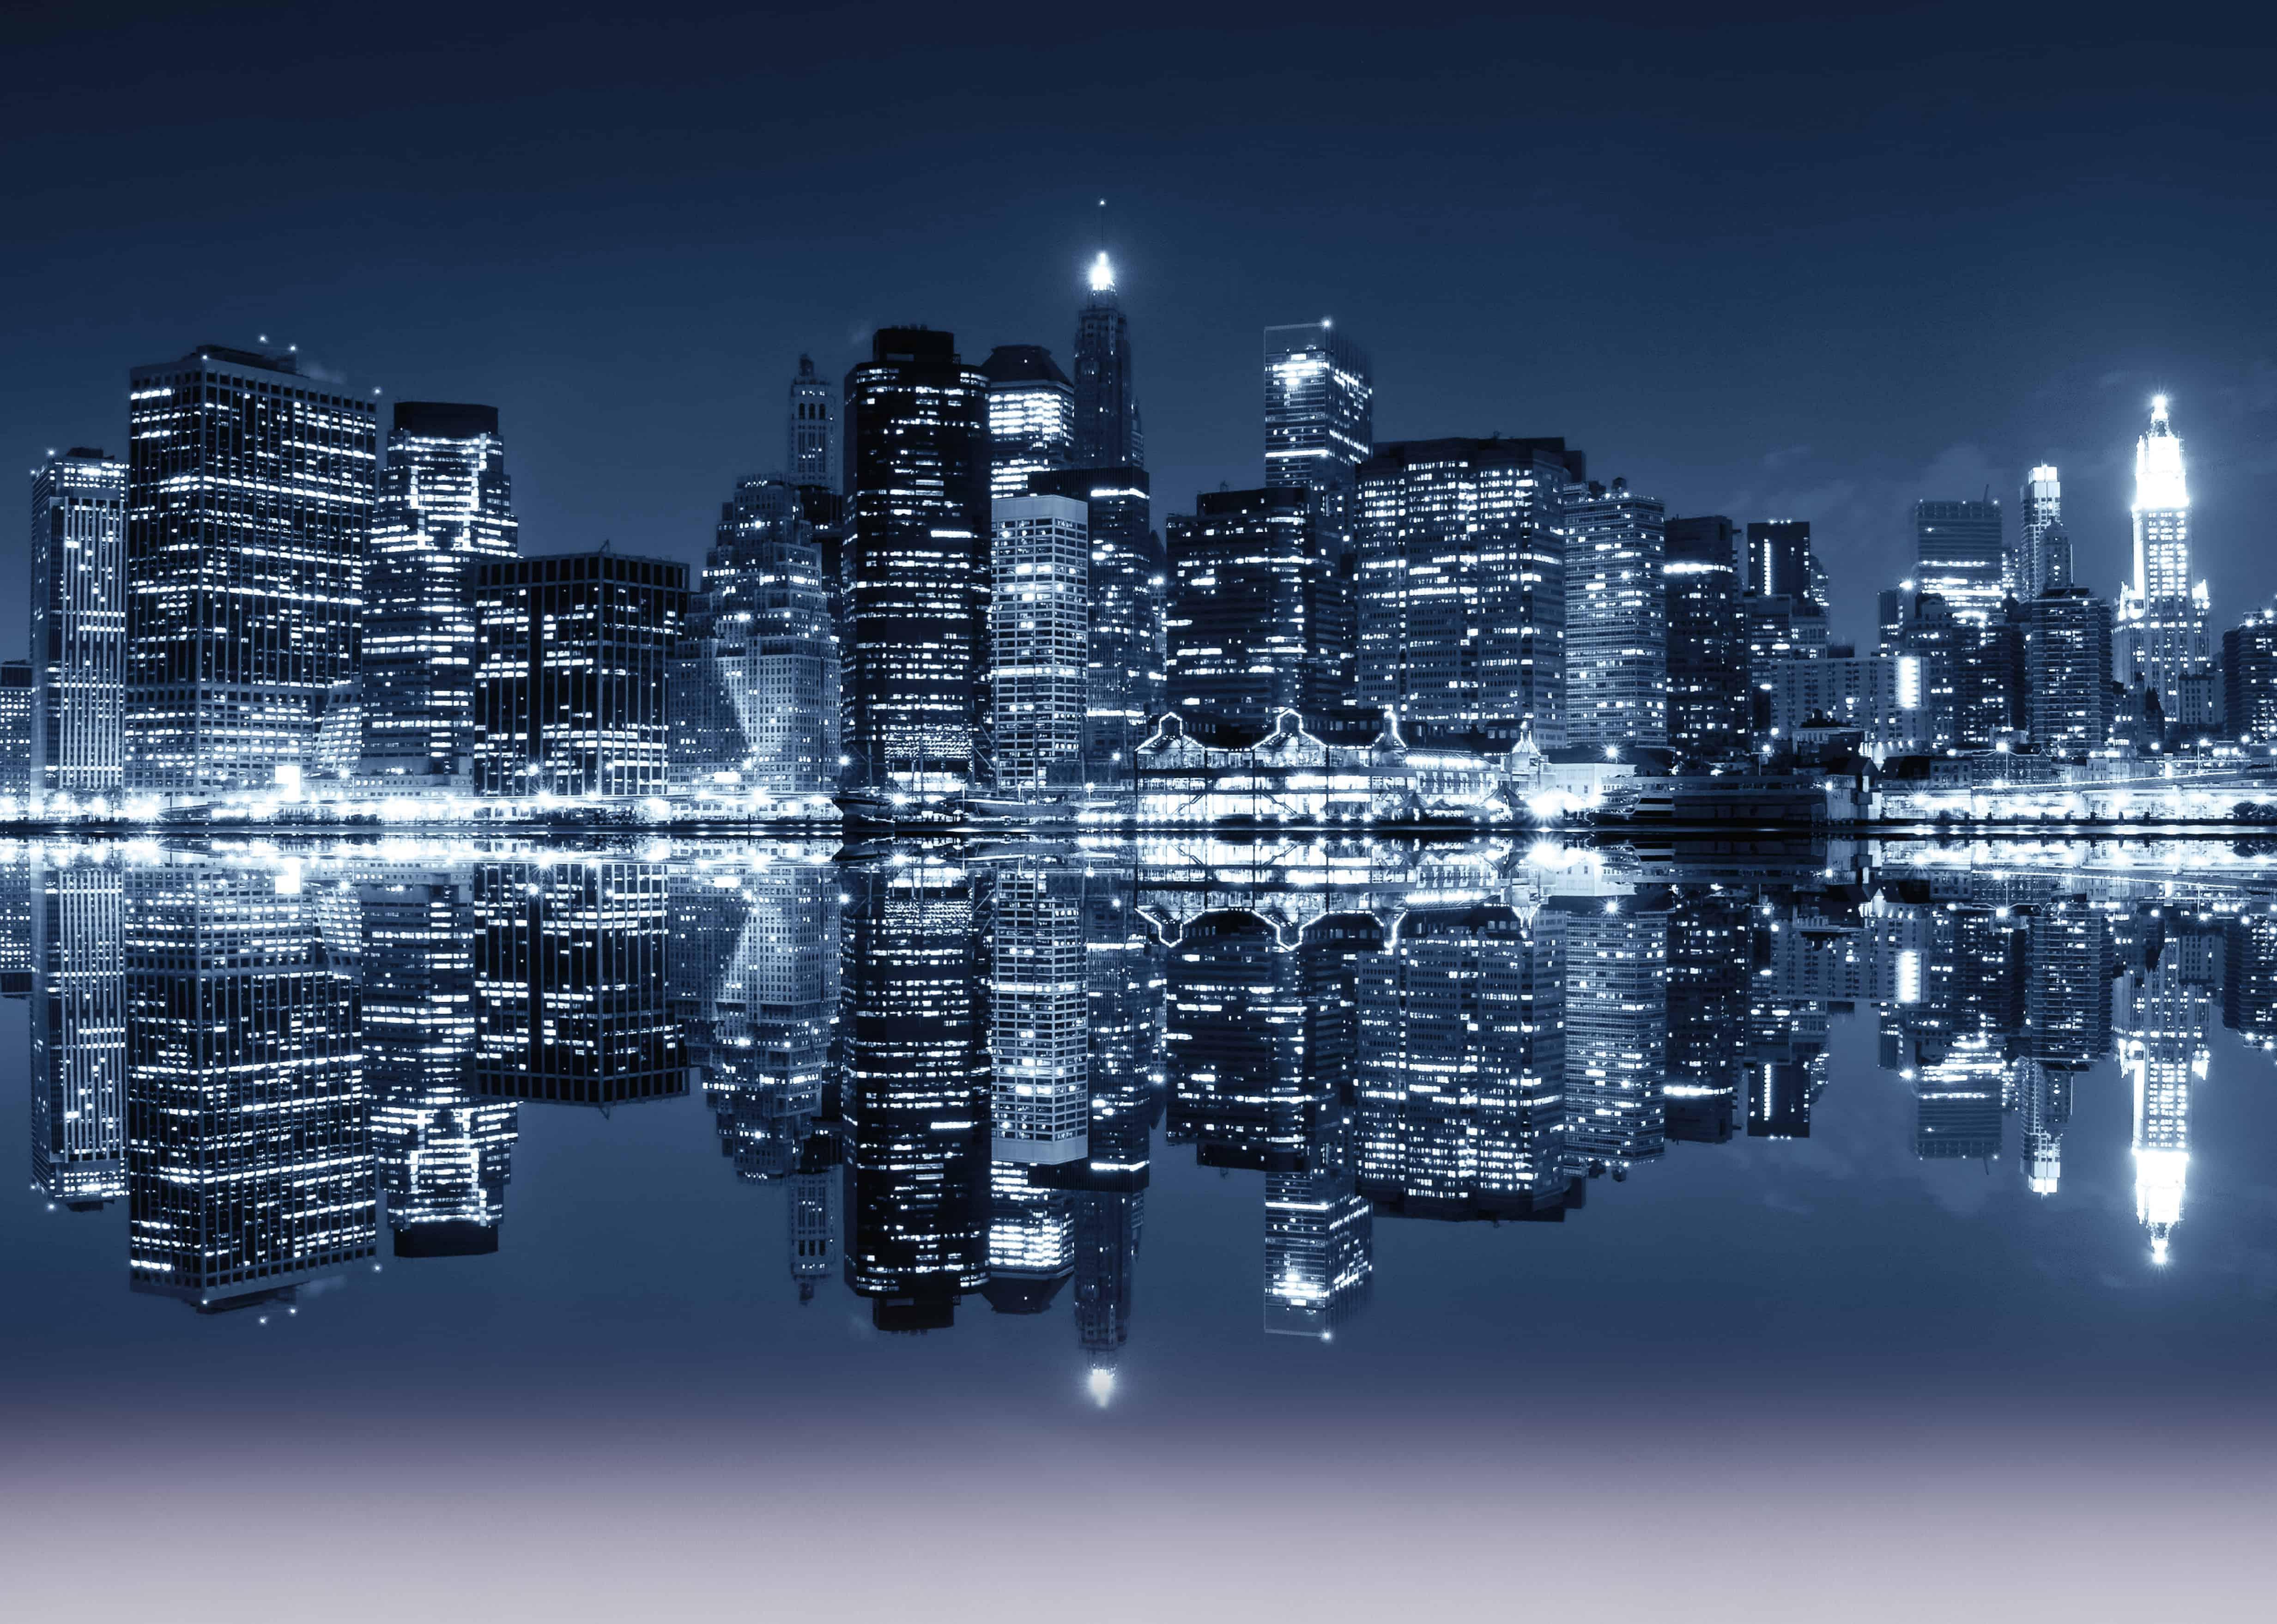 Schema Elettrico City : Sfondo city u feb home feb elettrica